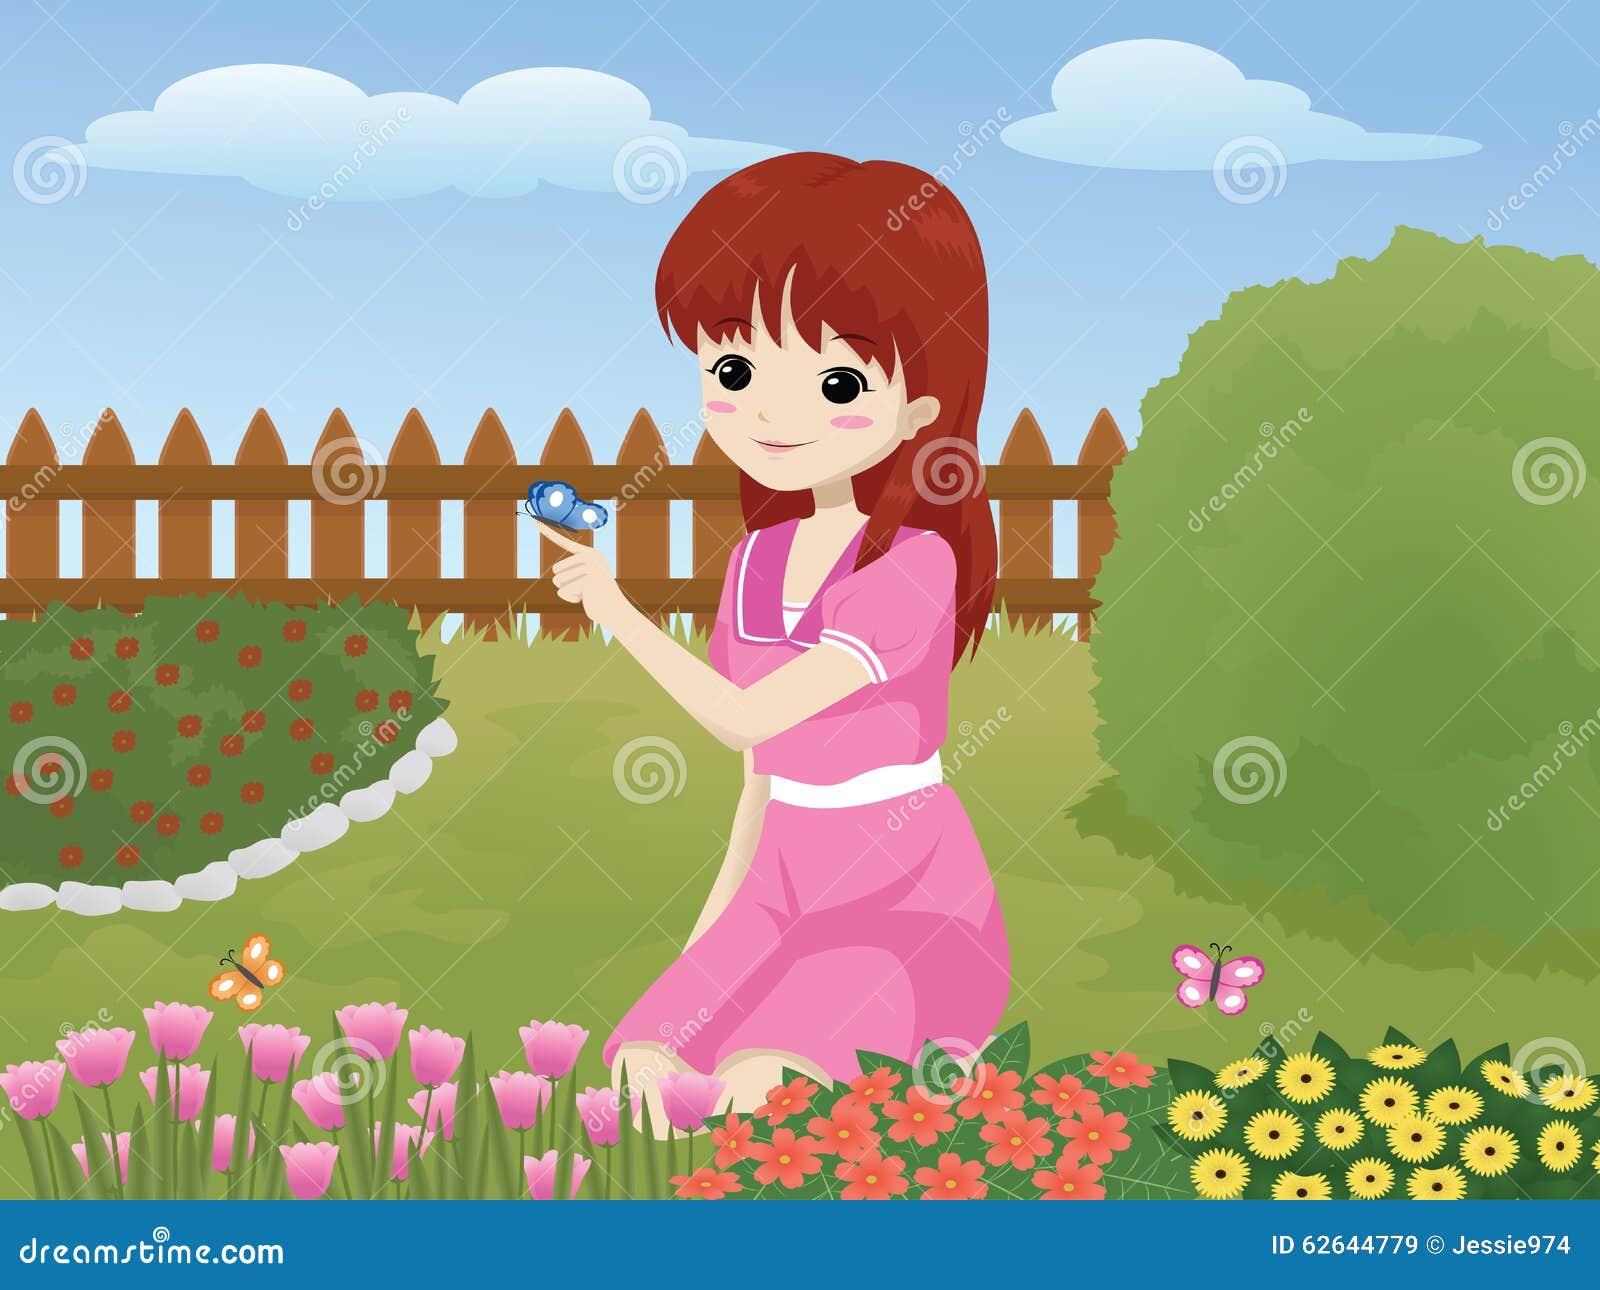 girl in the garden - The Girls In The Garden